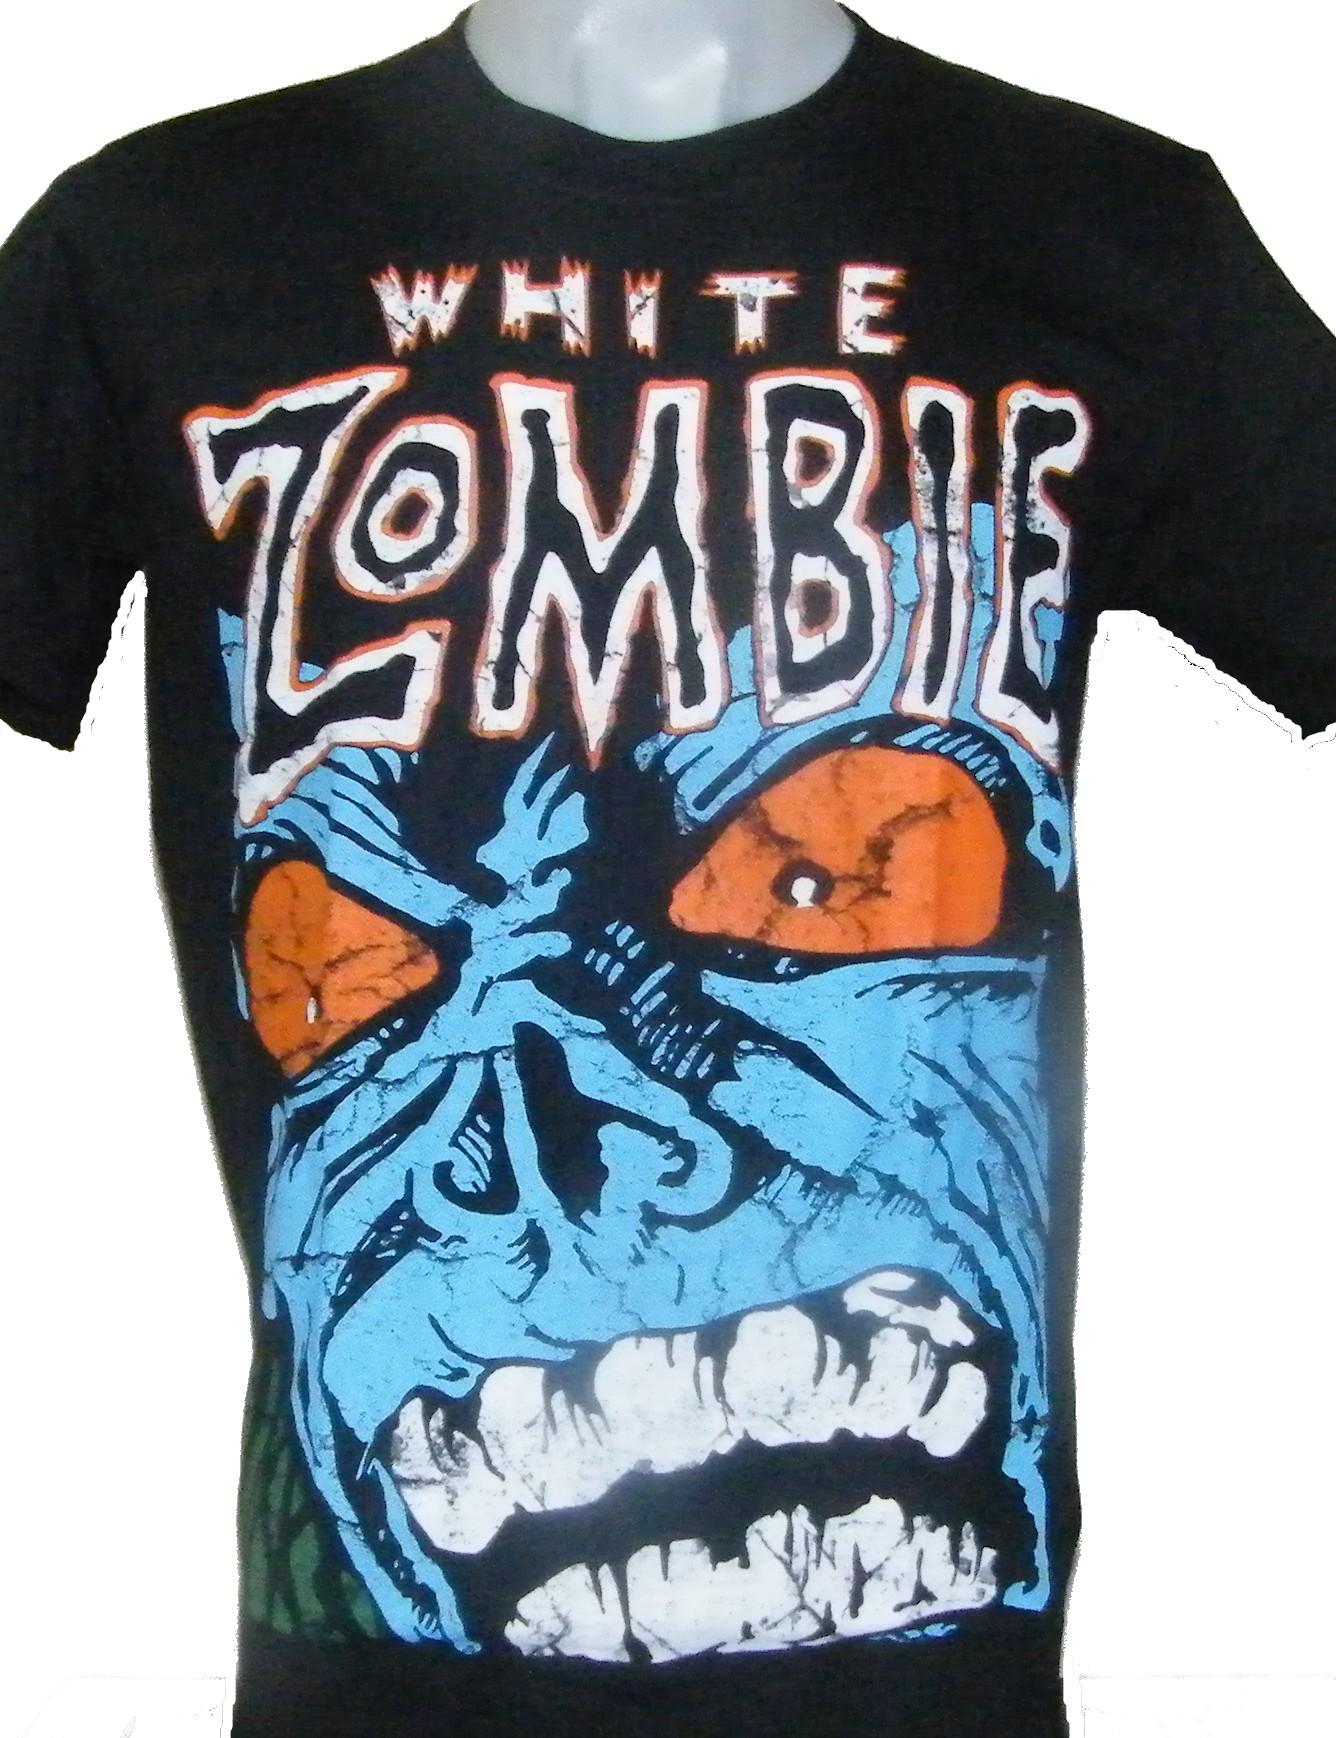 White zombie hoodie